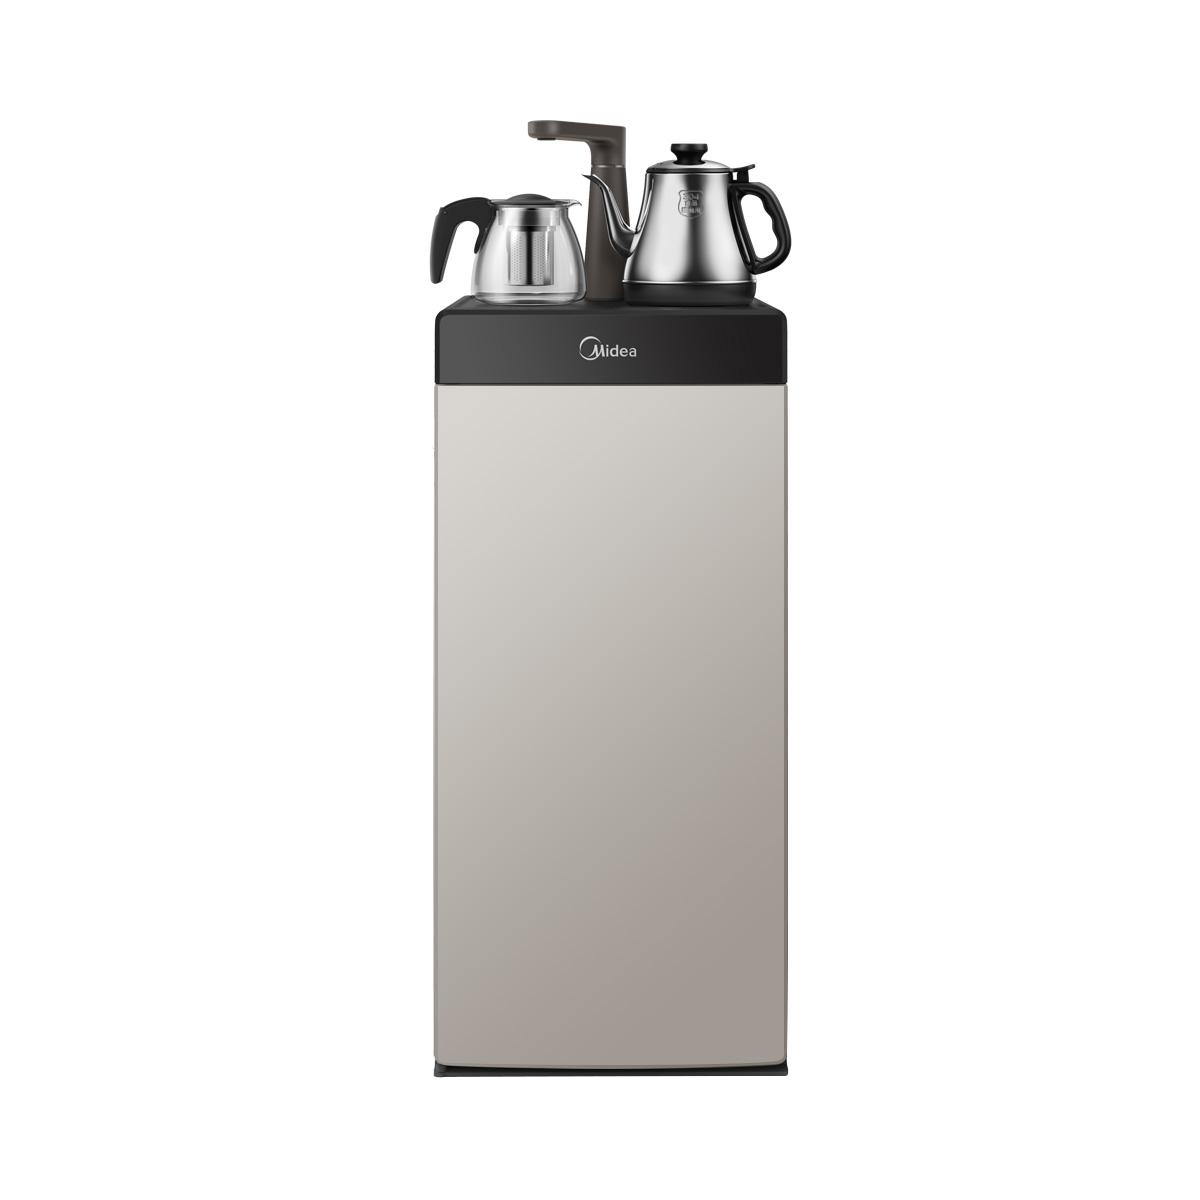 Midea/美的 YR1022S-X饮水机 说明书.pdf